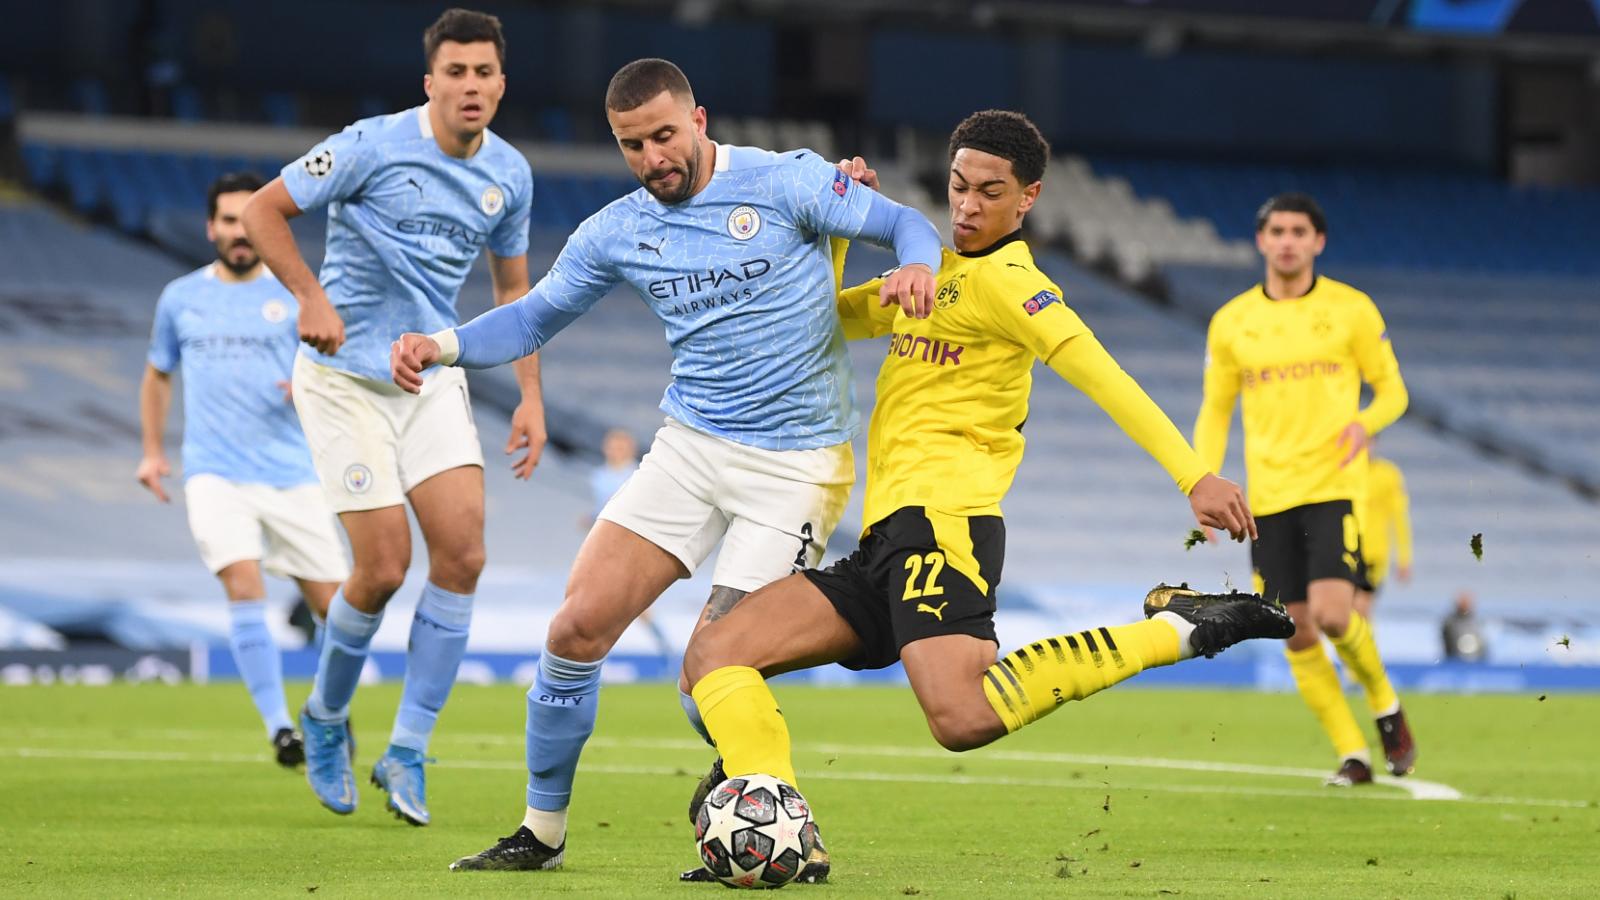 BVB: So kommt Borussia Dortmund ins Halbfinale der Champions League